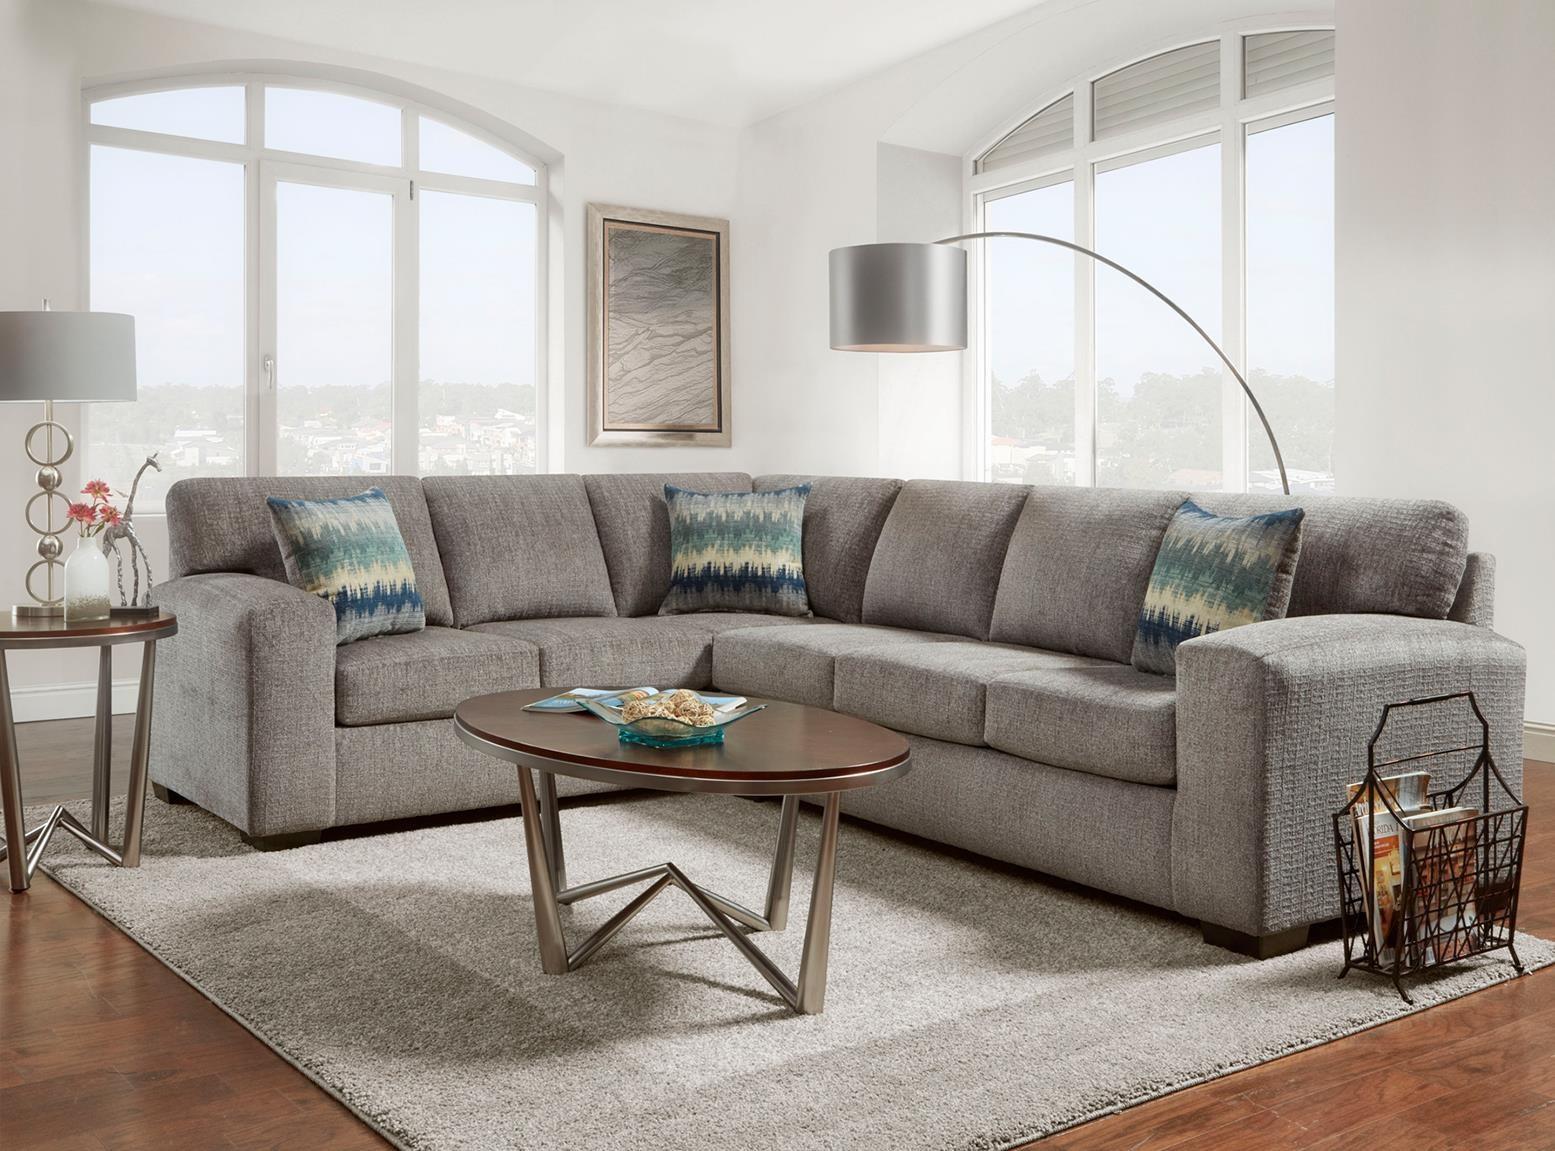 2PC Sectional Sofa